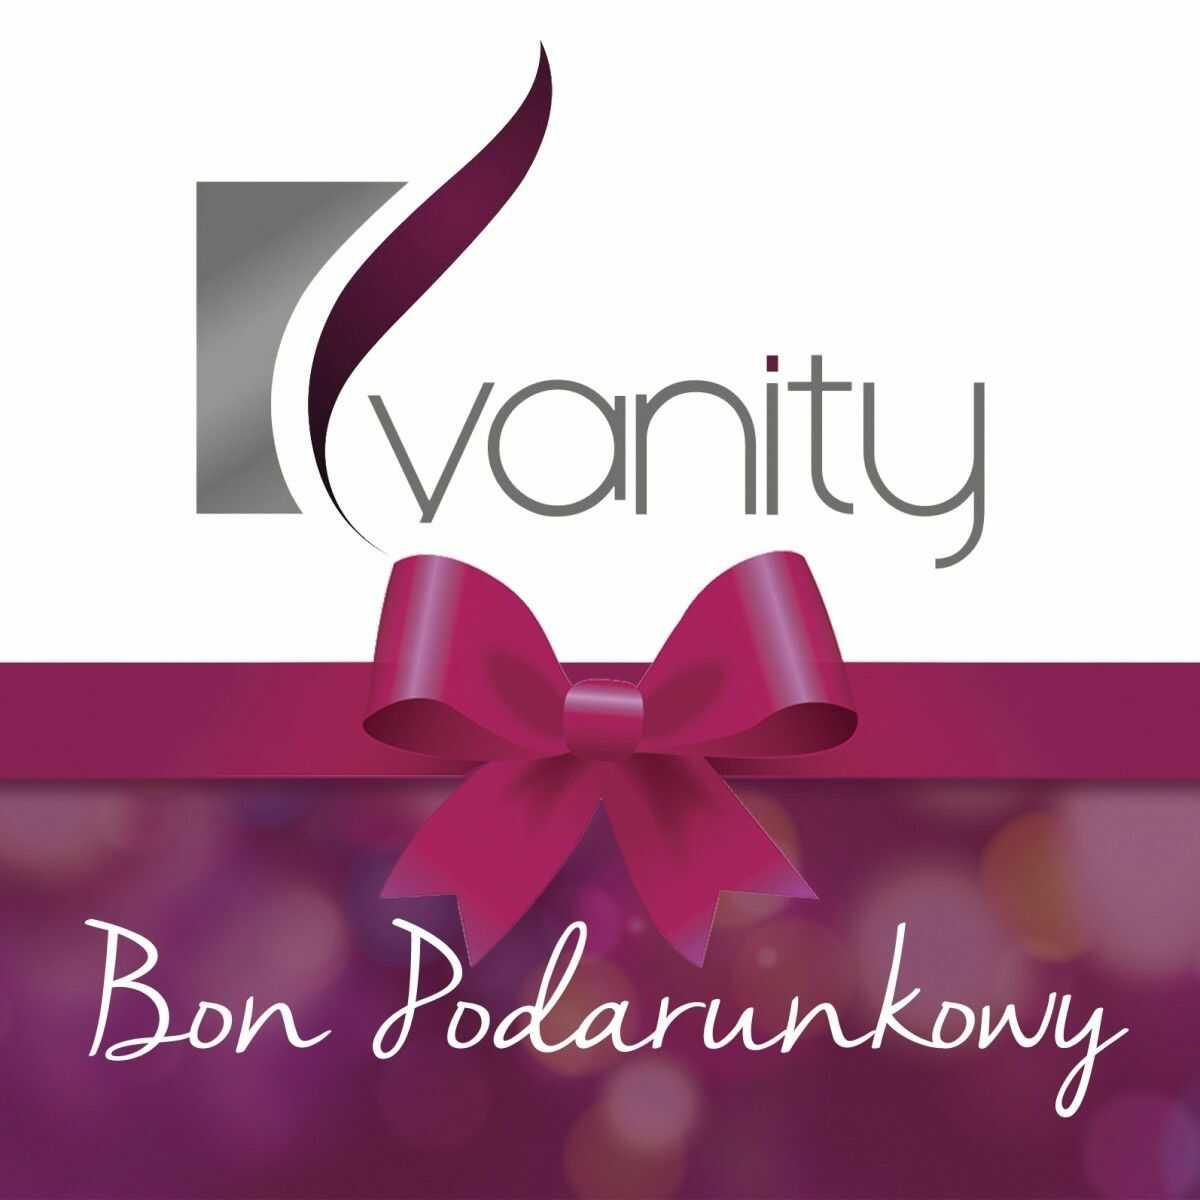 Vanity Bon Podarunkowy, 200 Zł BON200